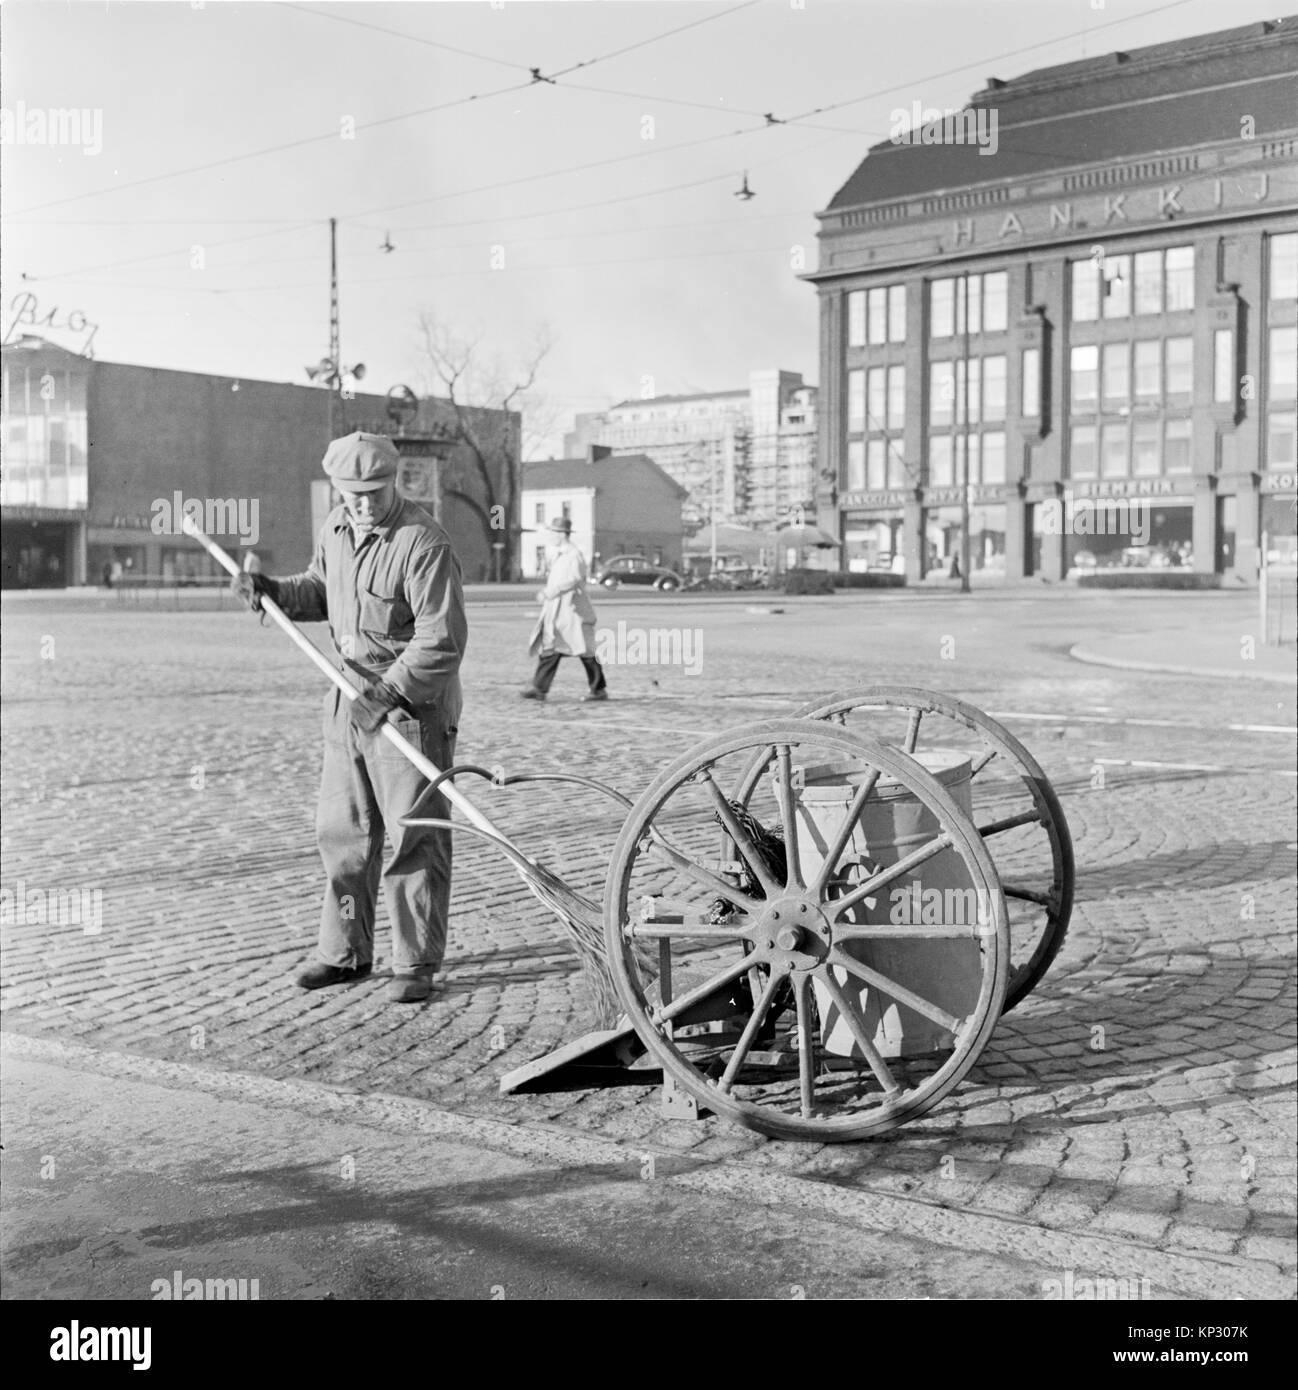 Male cleaner worker sweeping street Helsinki, Finland 1995 - Stock Image